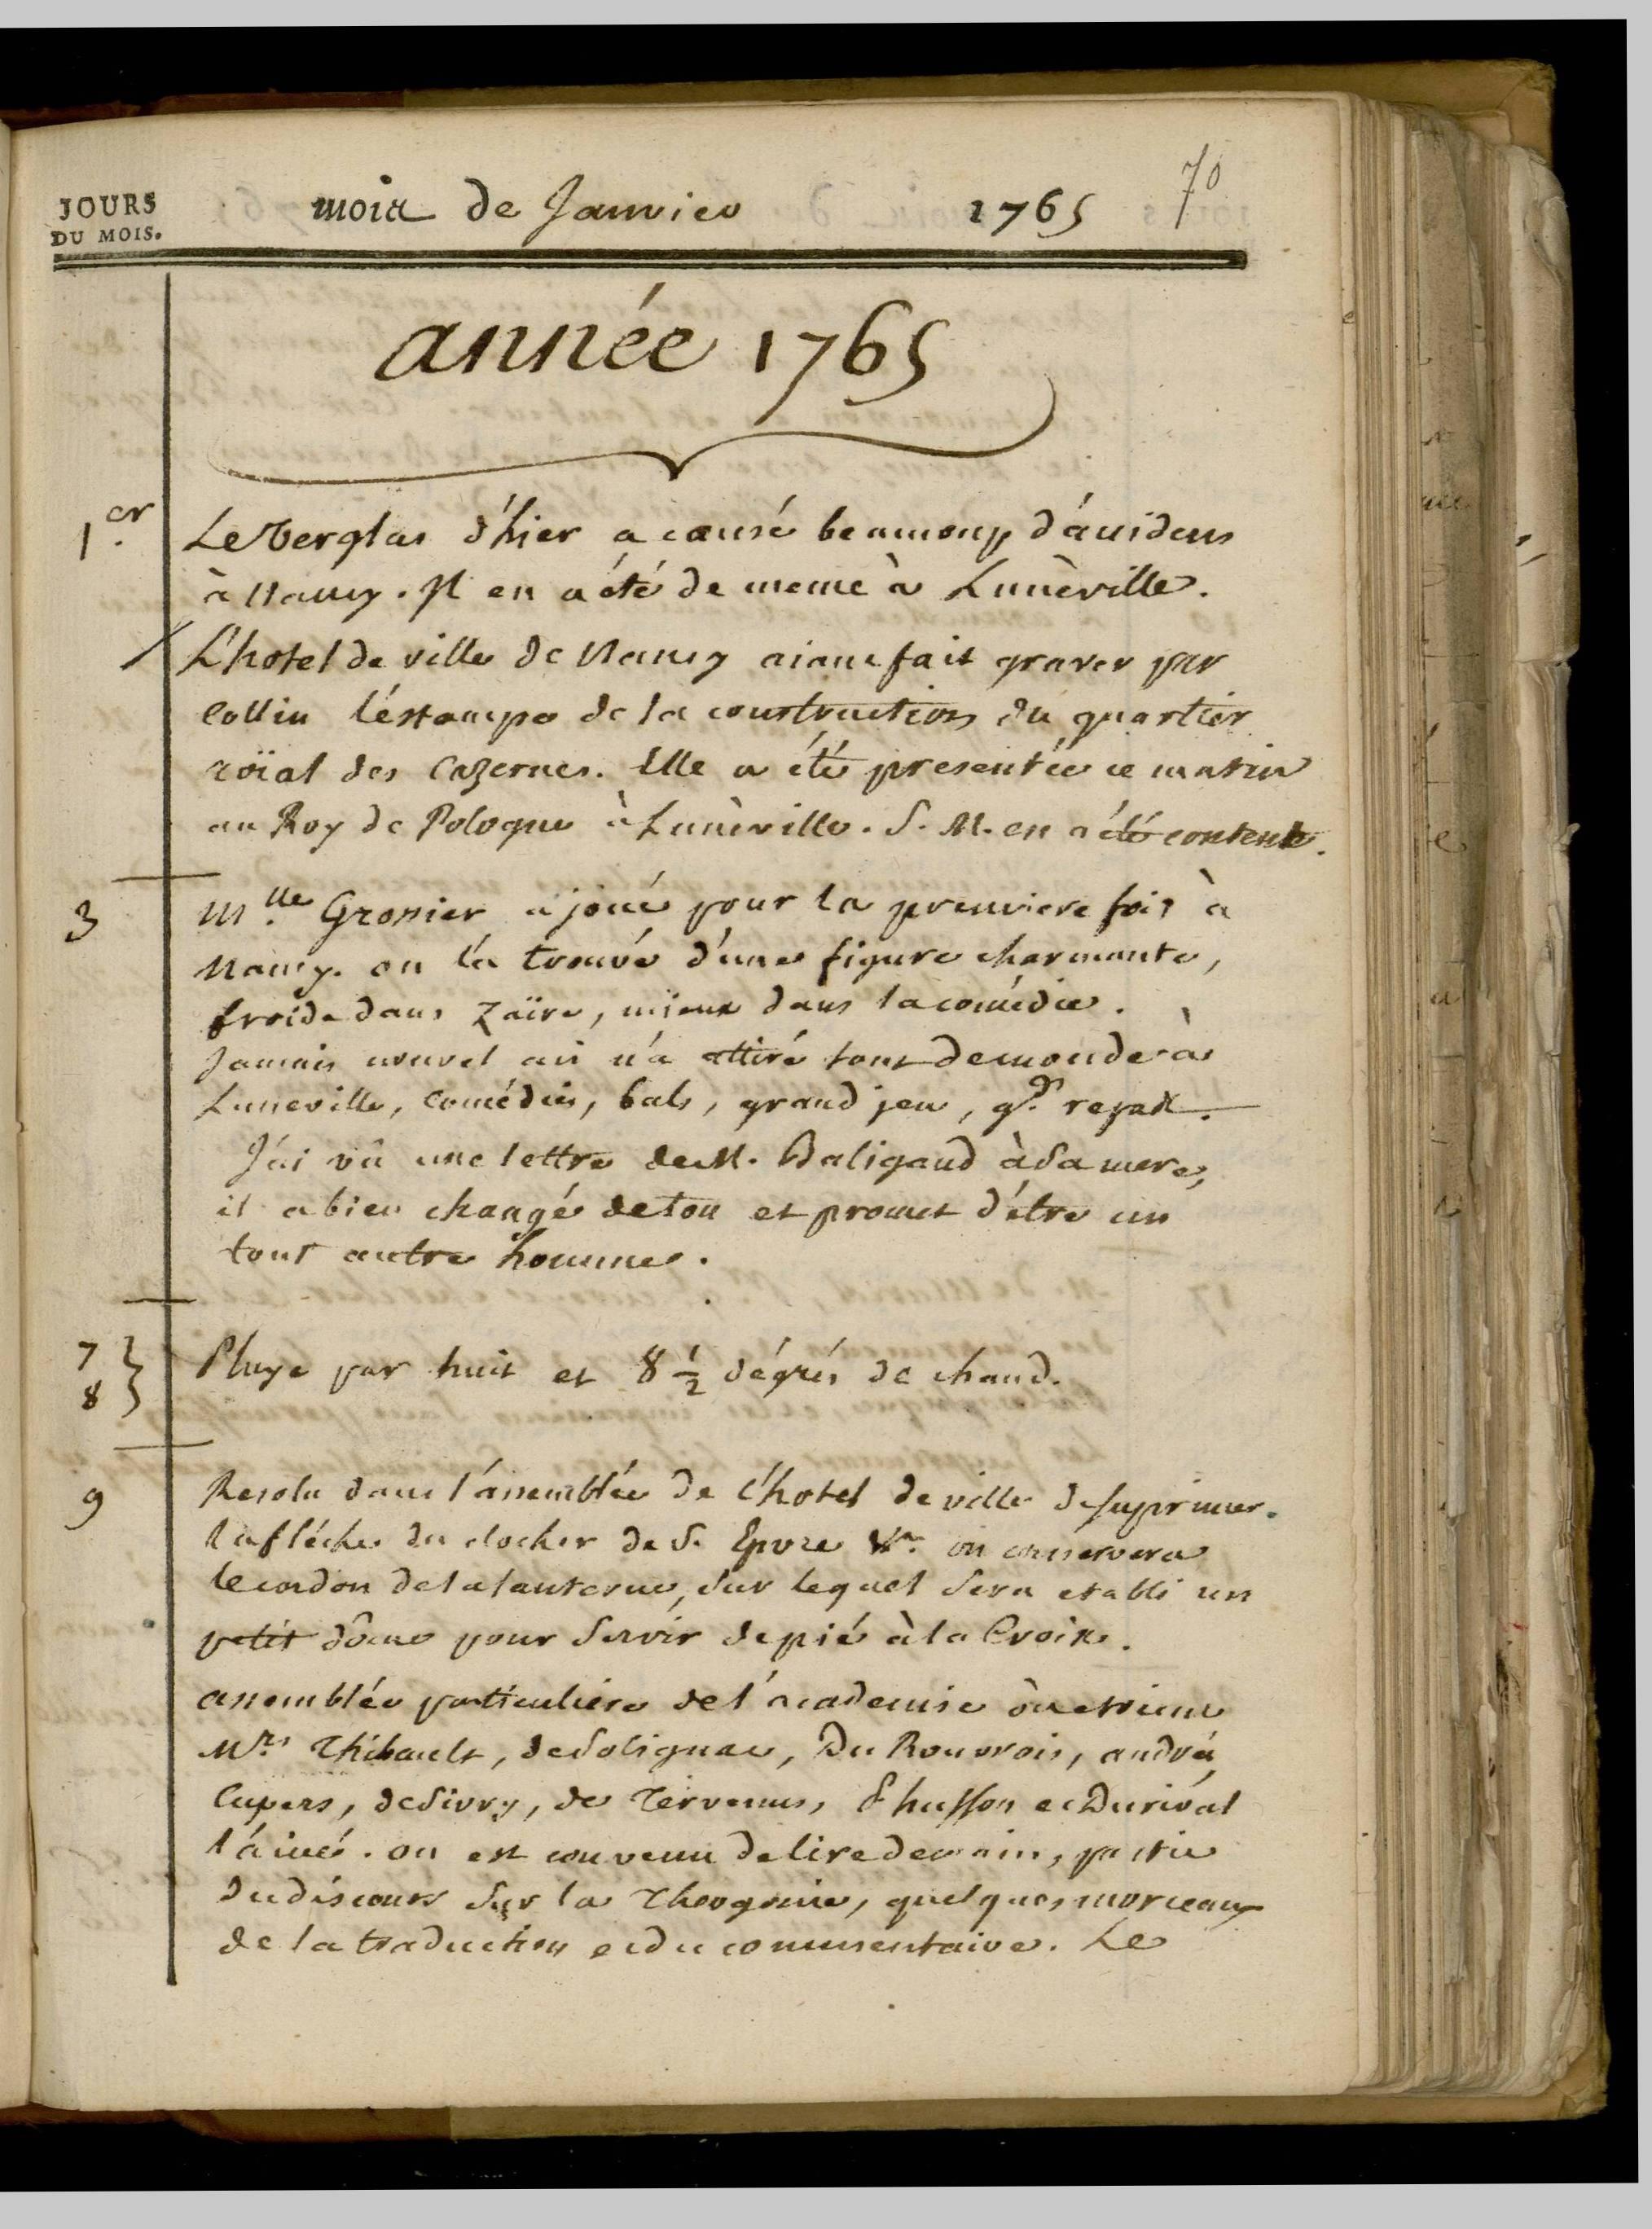 Journal de Durival, 1er janvier 1765